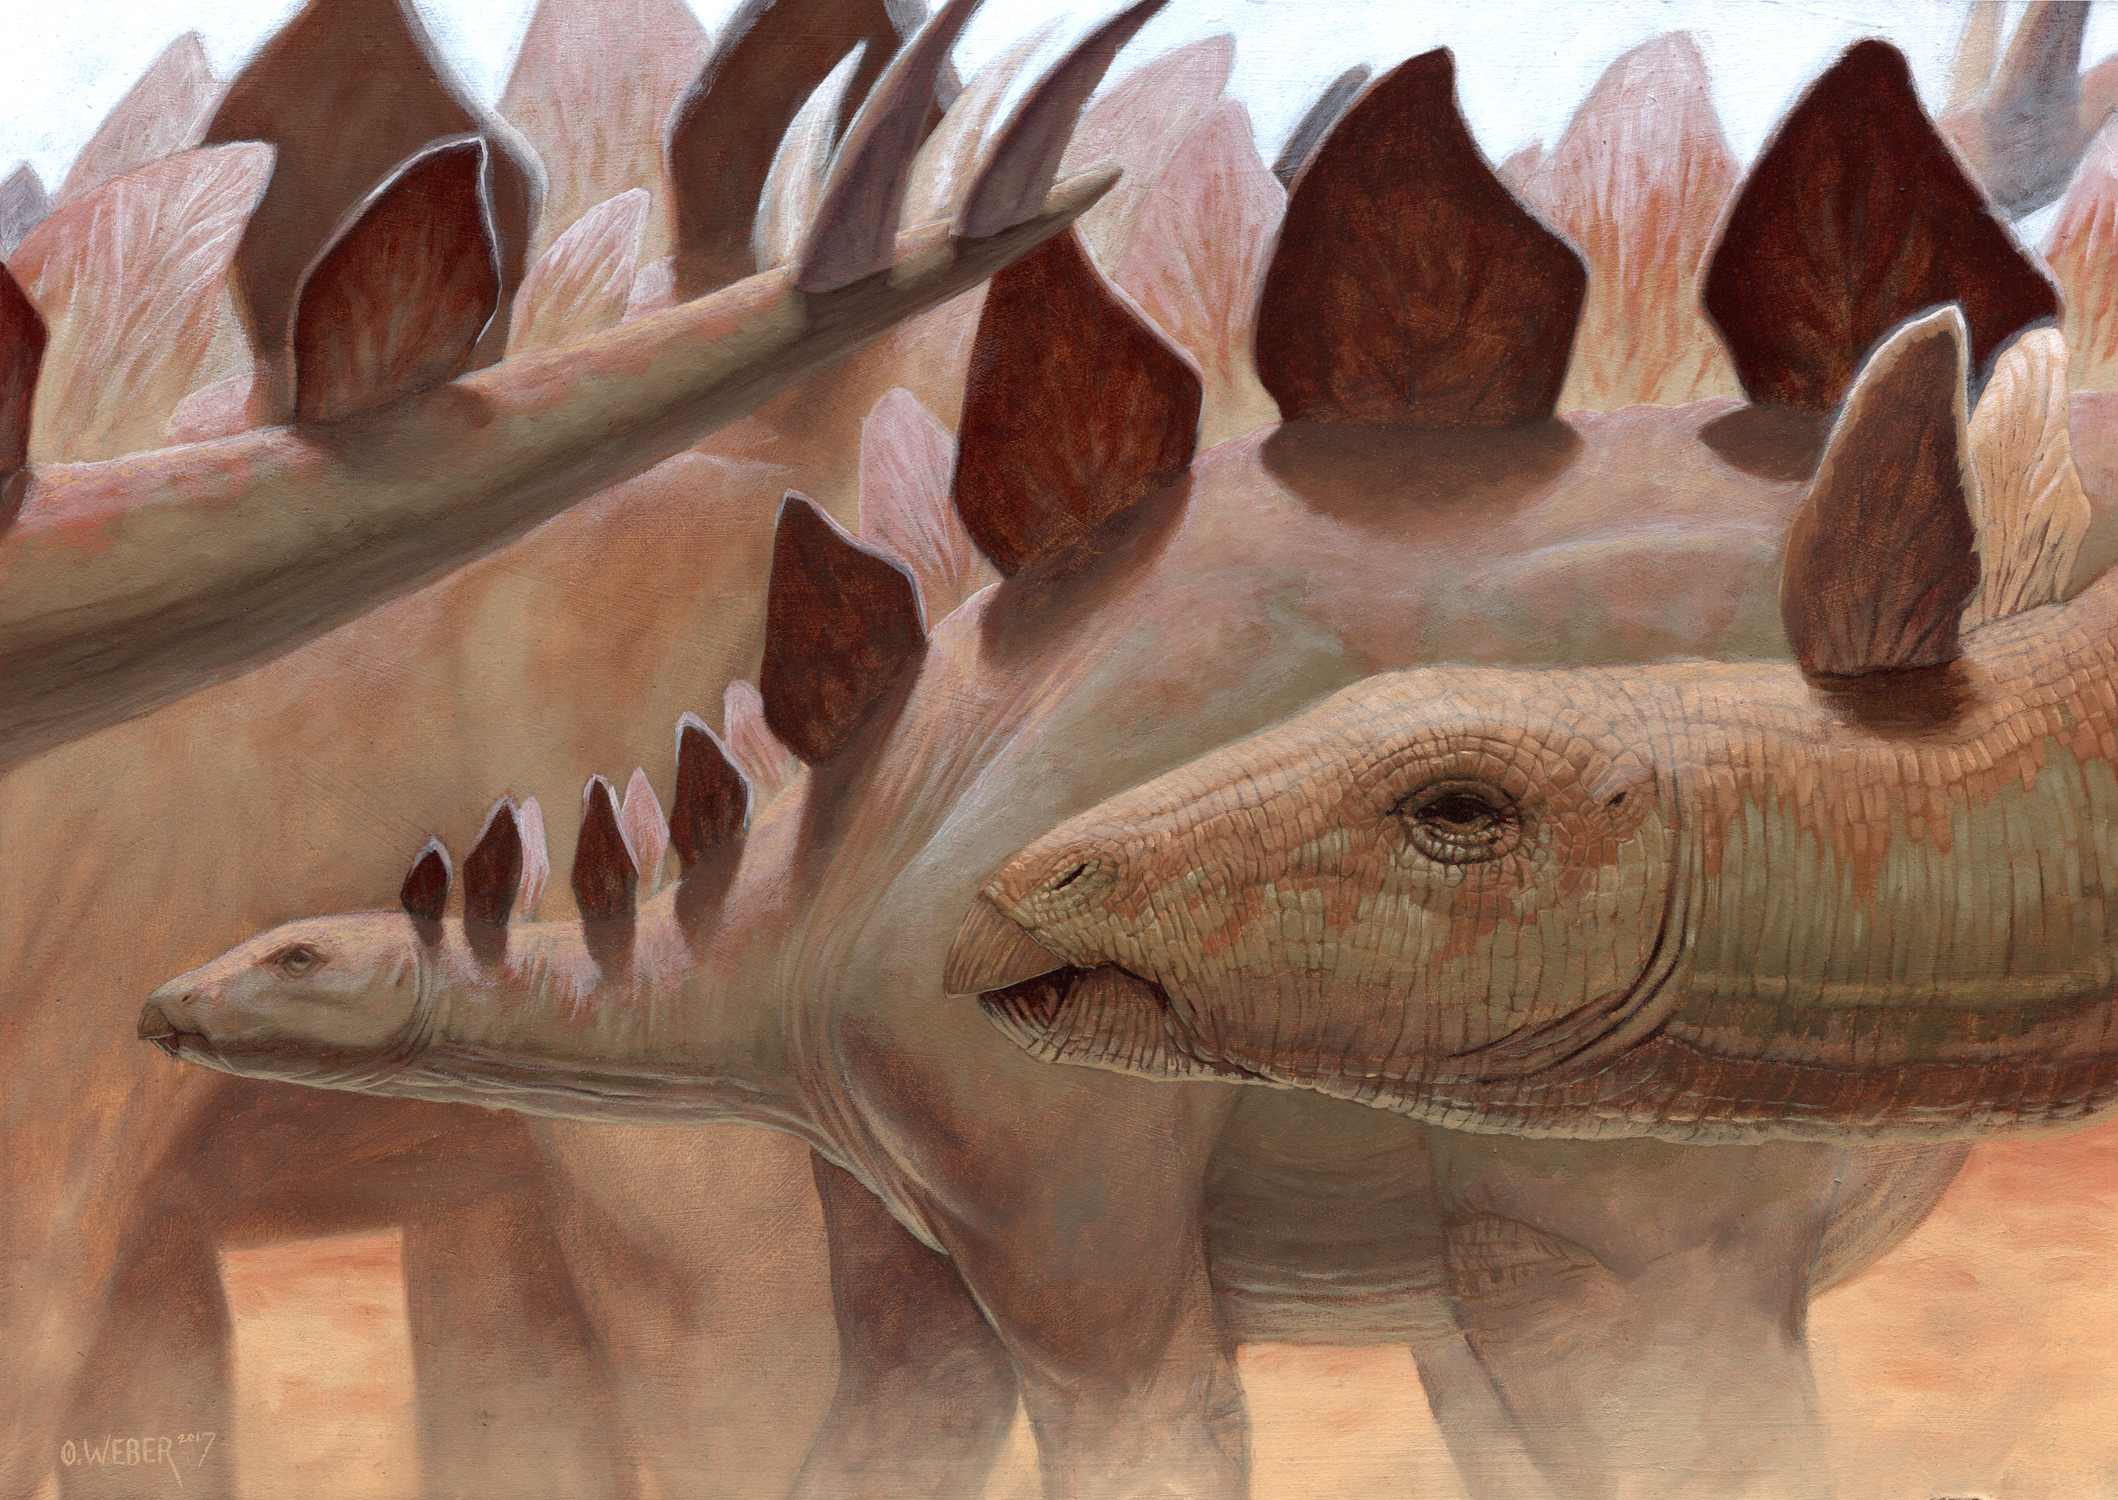 Stegosaurus Artwork by Owen Weber